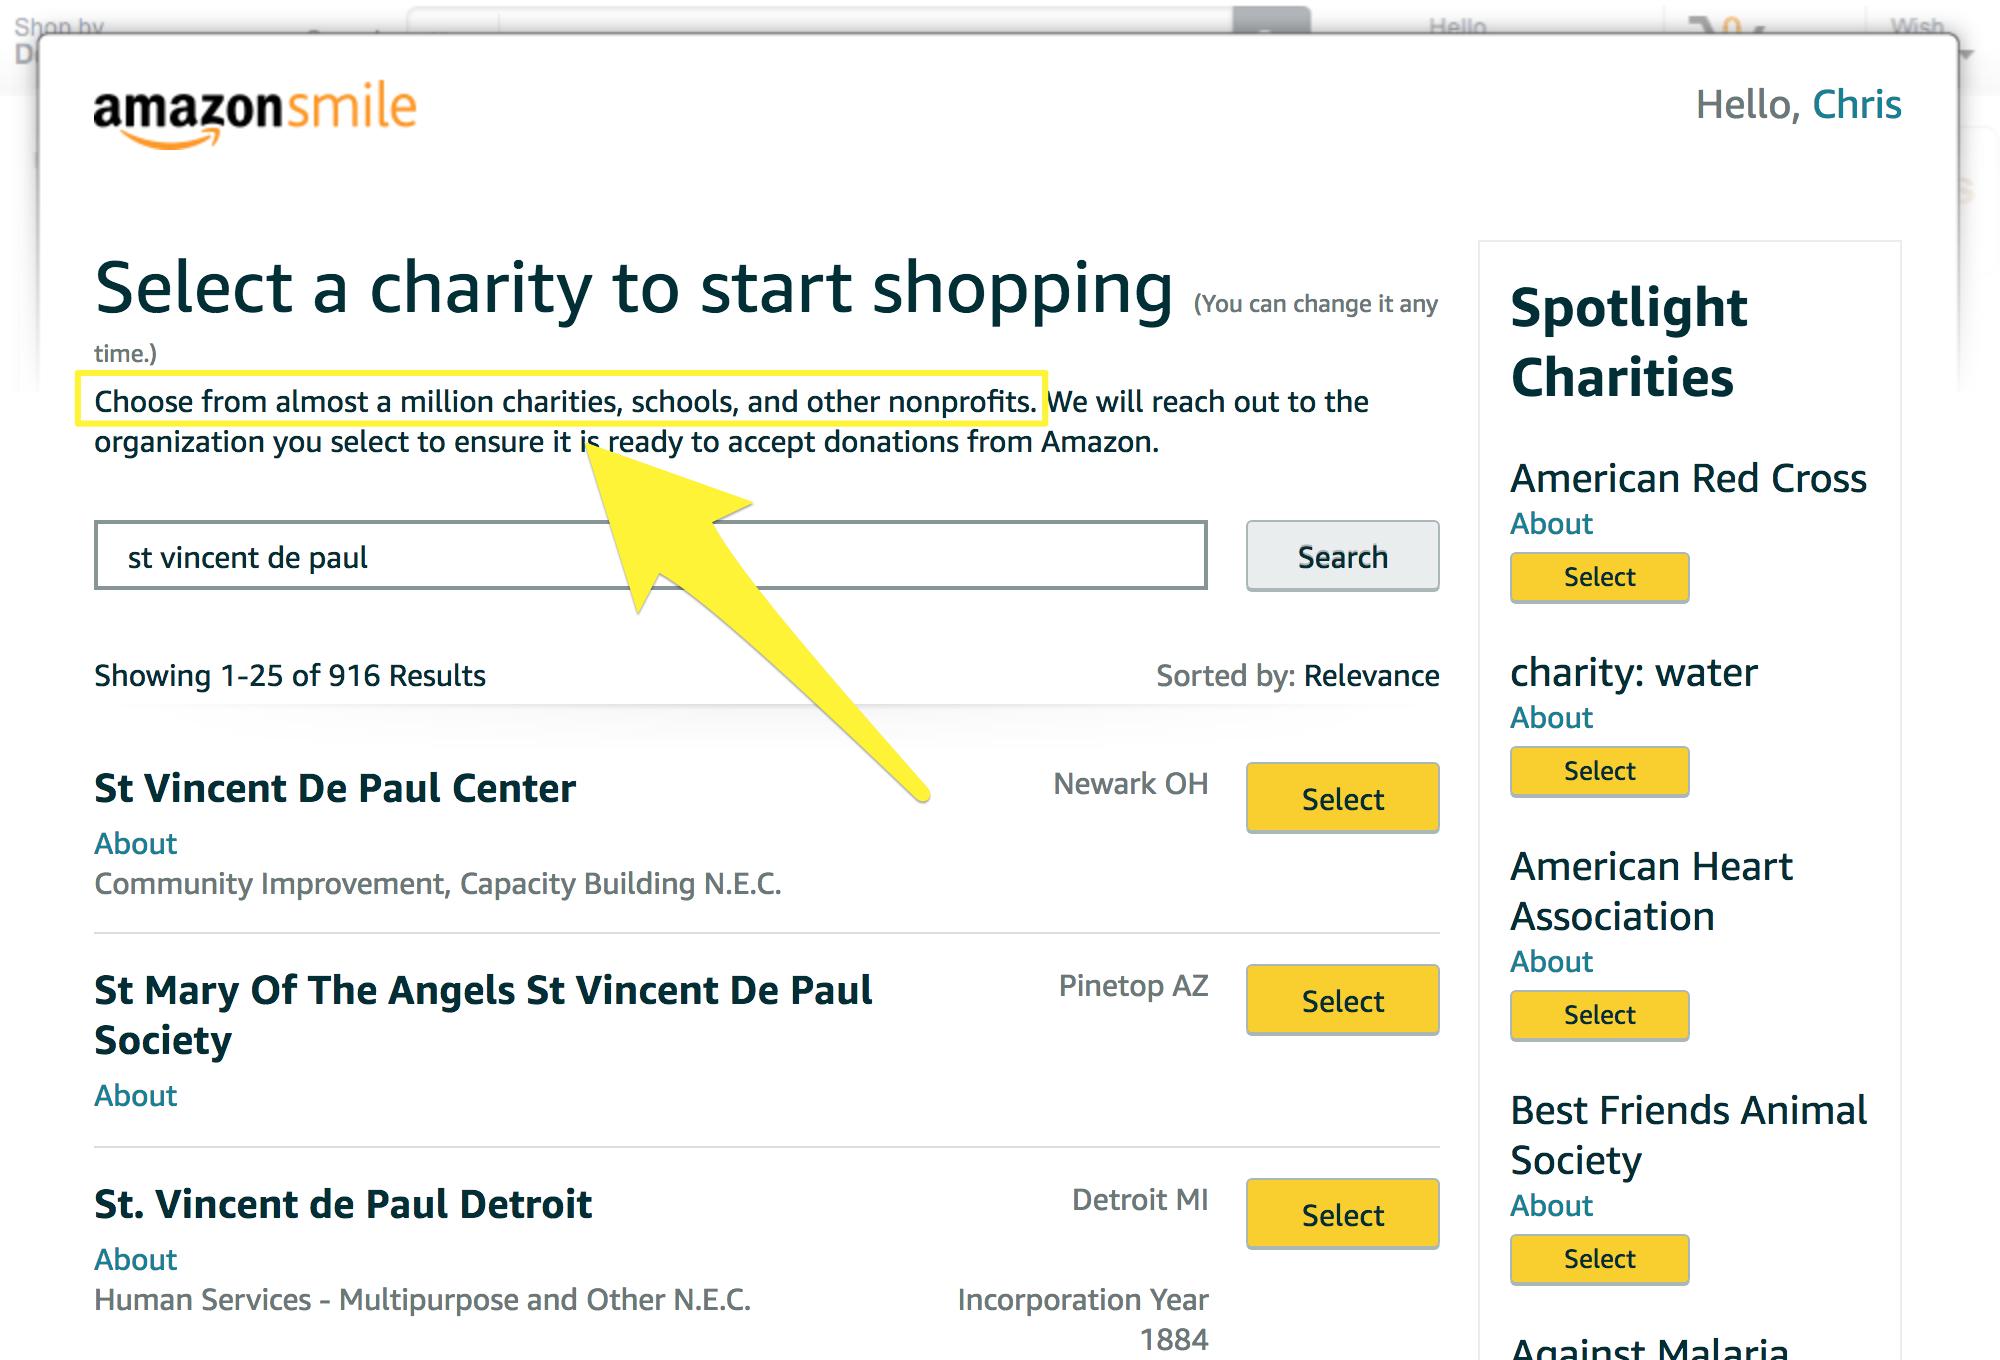 screenshot showing the charity options on amazon